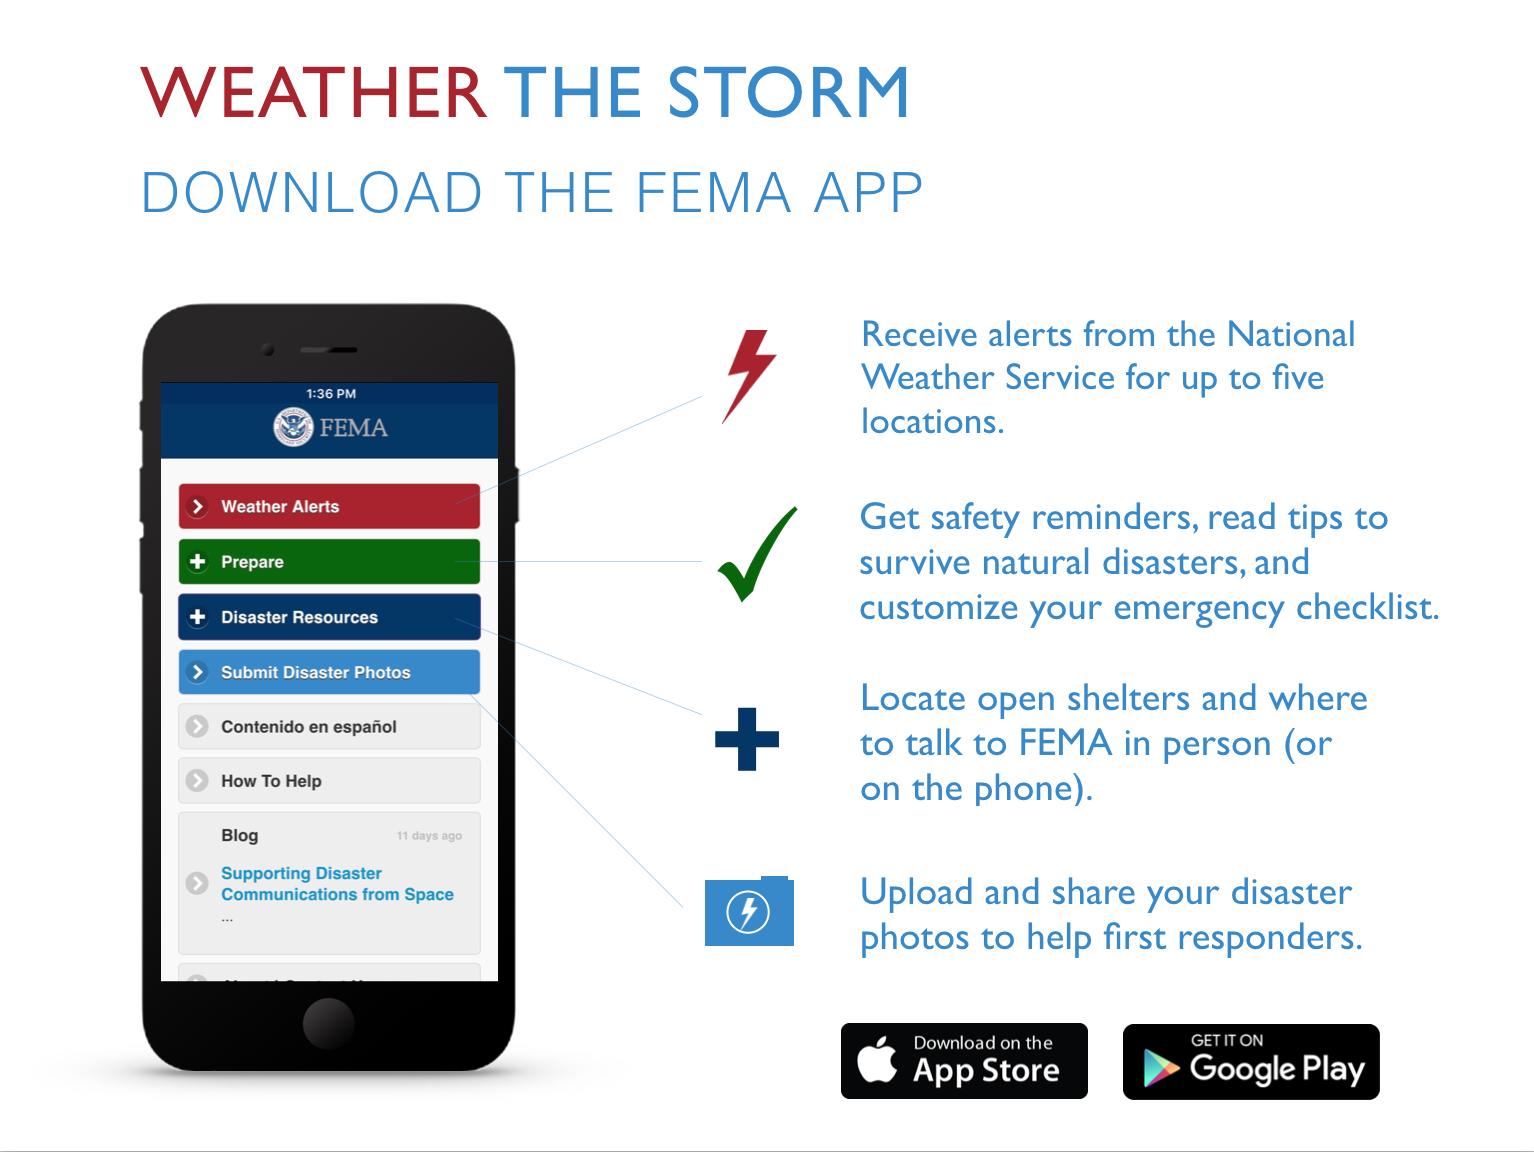 FEMA App Infographic